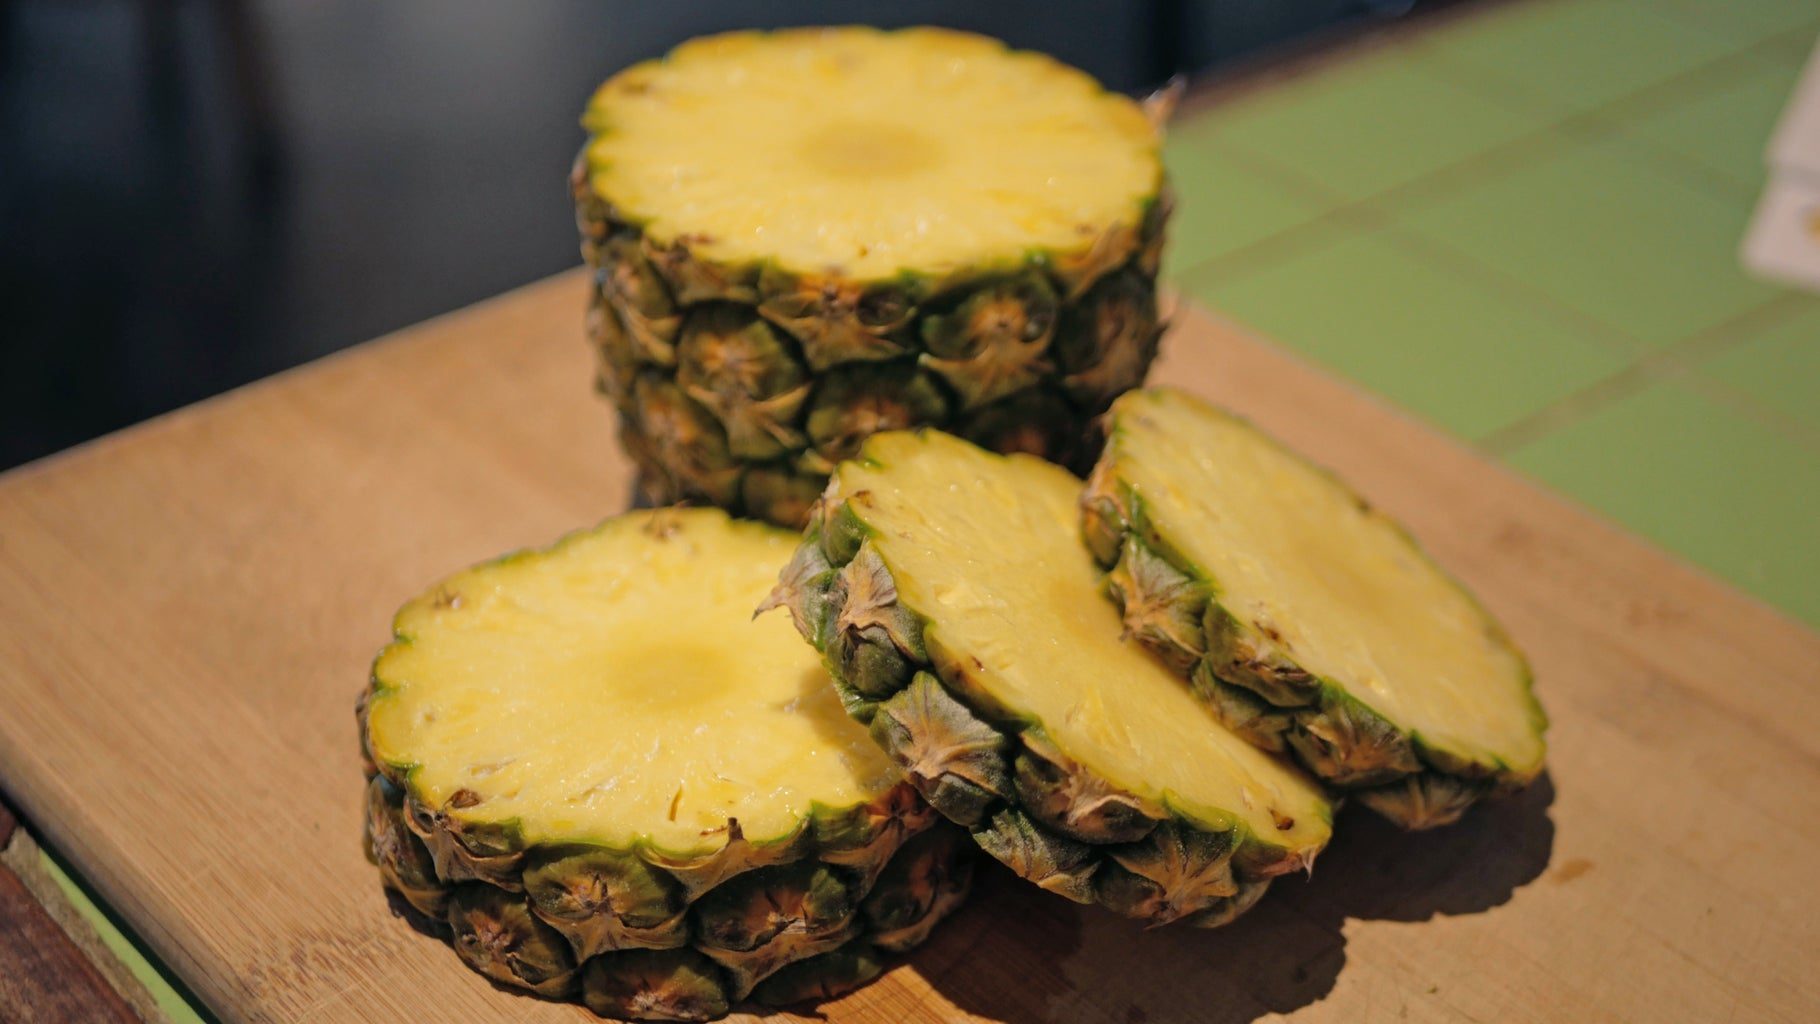 Prepare the Pineapple